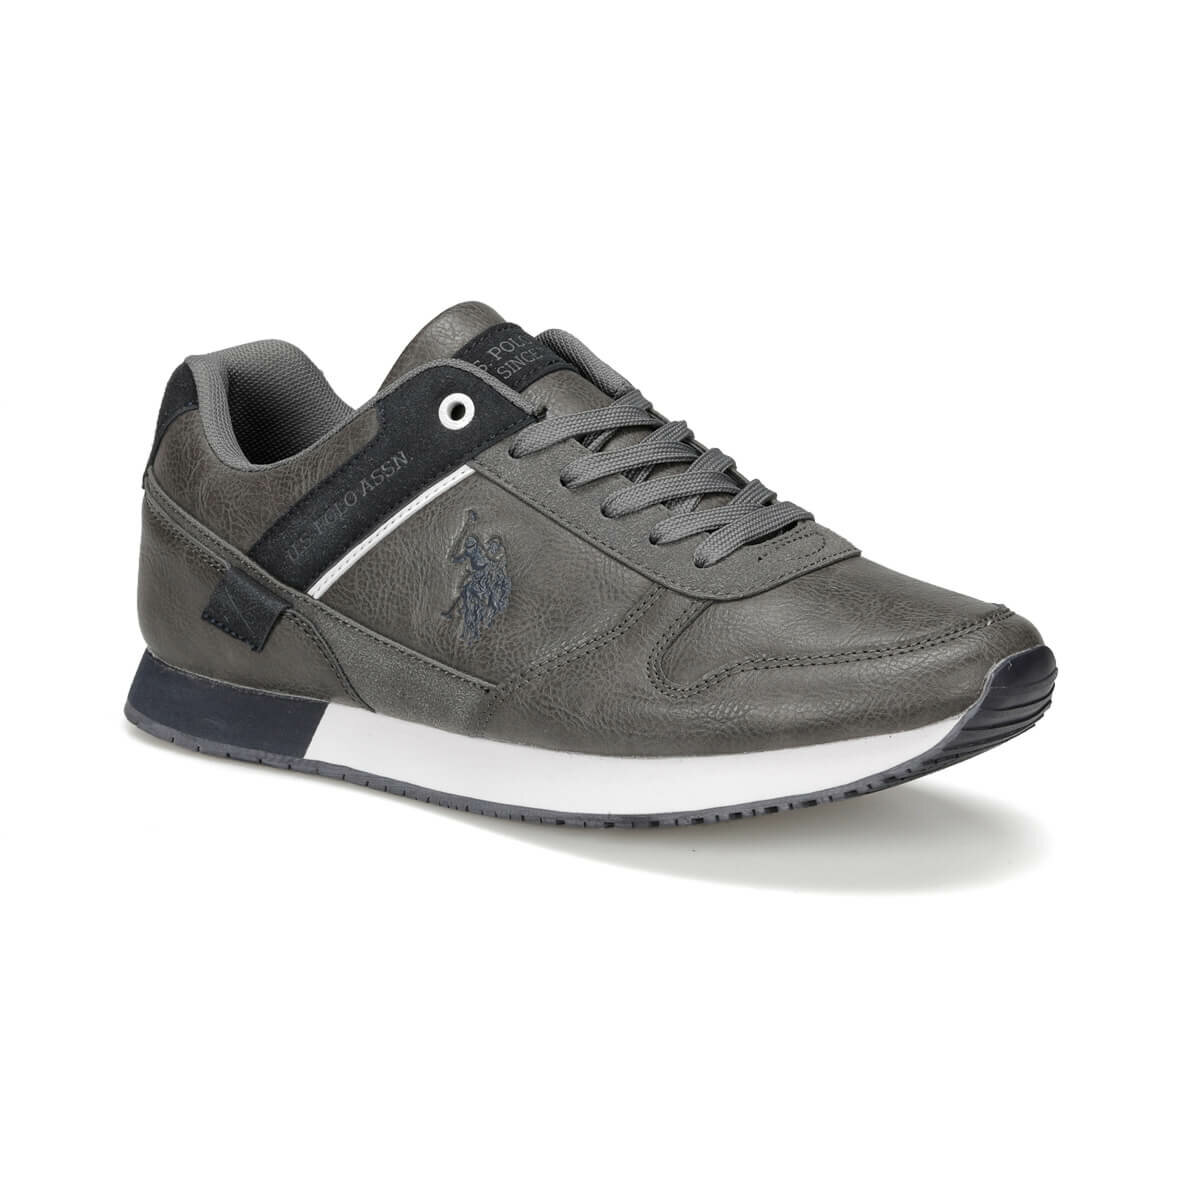 FLO Gray Men's Sneaker Shoes Man U.S. POLO ASSN. FORTH 9PR